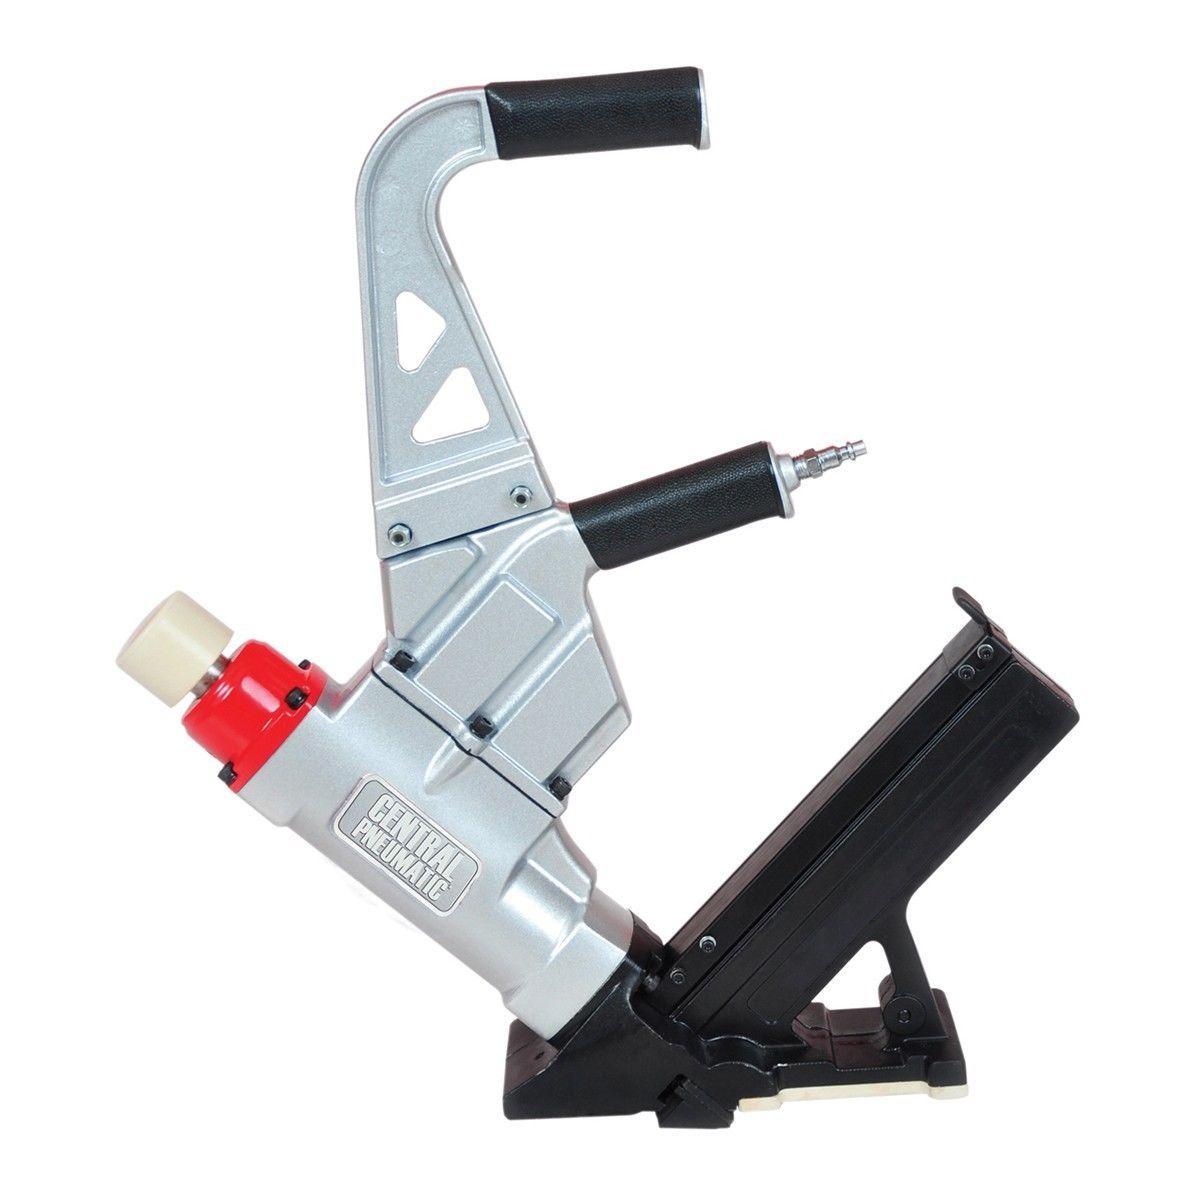 Air Nailer Stapler 2-in-1 Easily Install Hardwood Floors Professional Quality